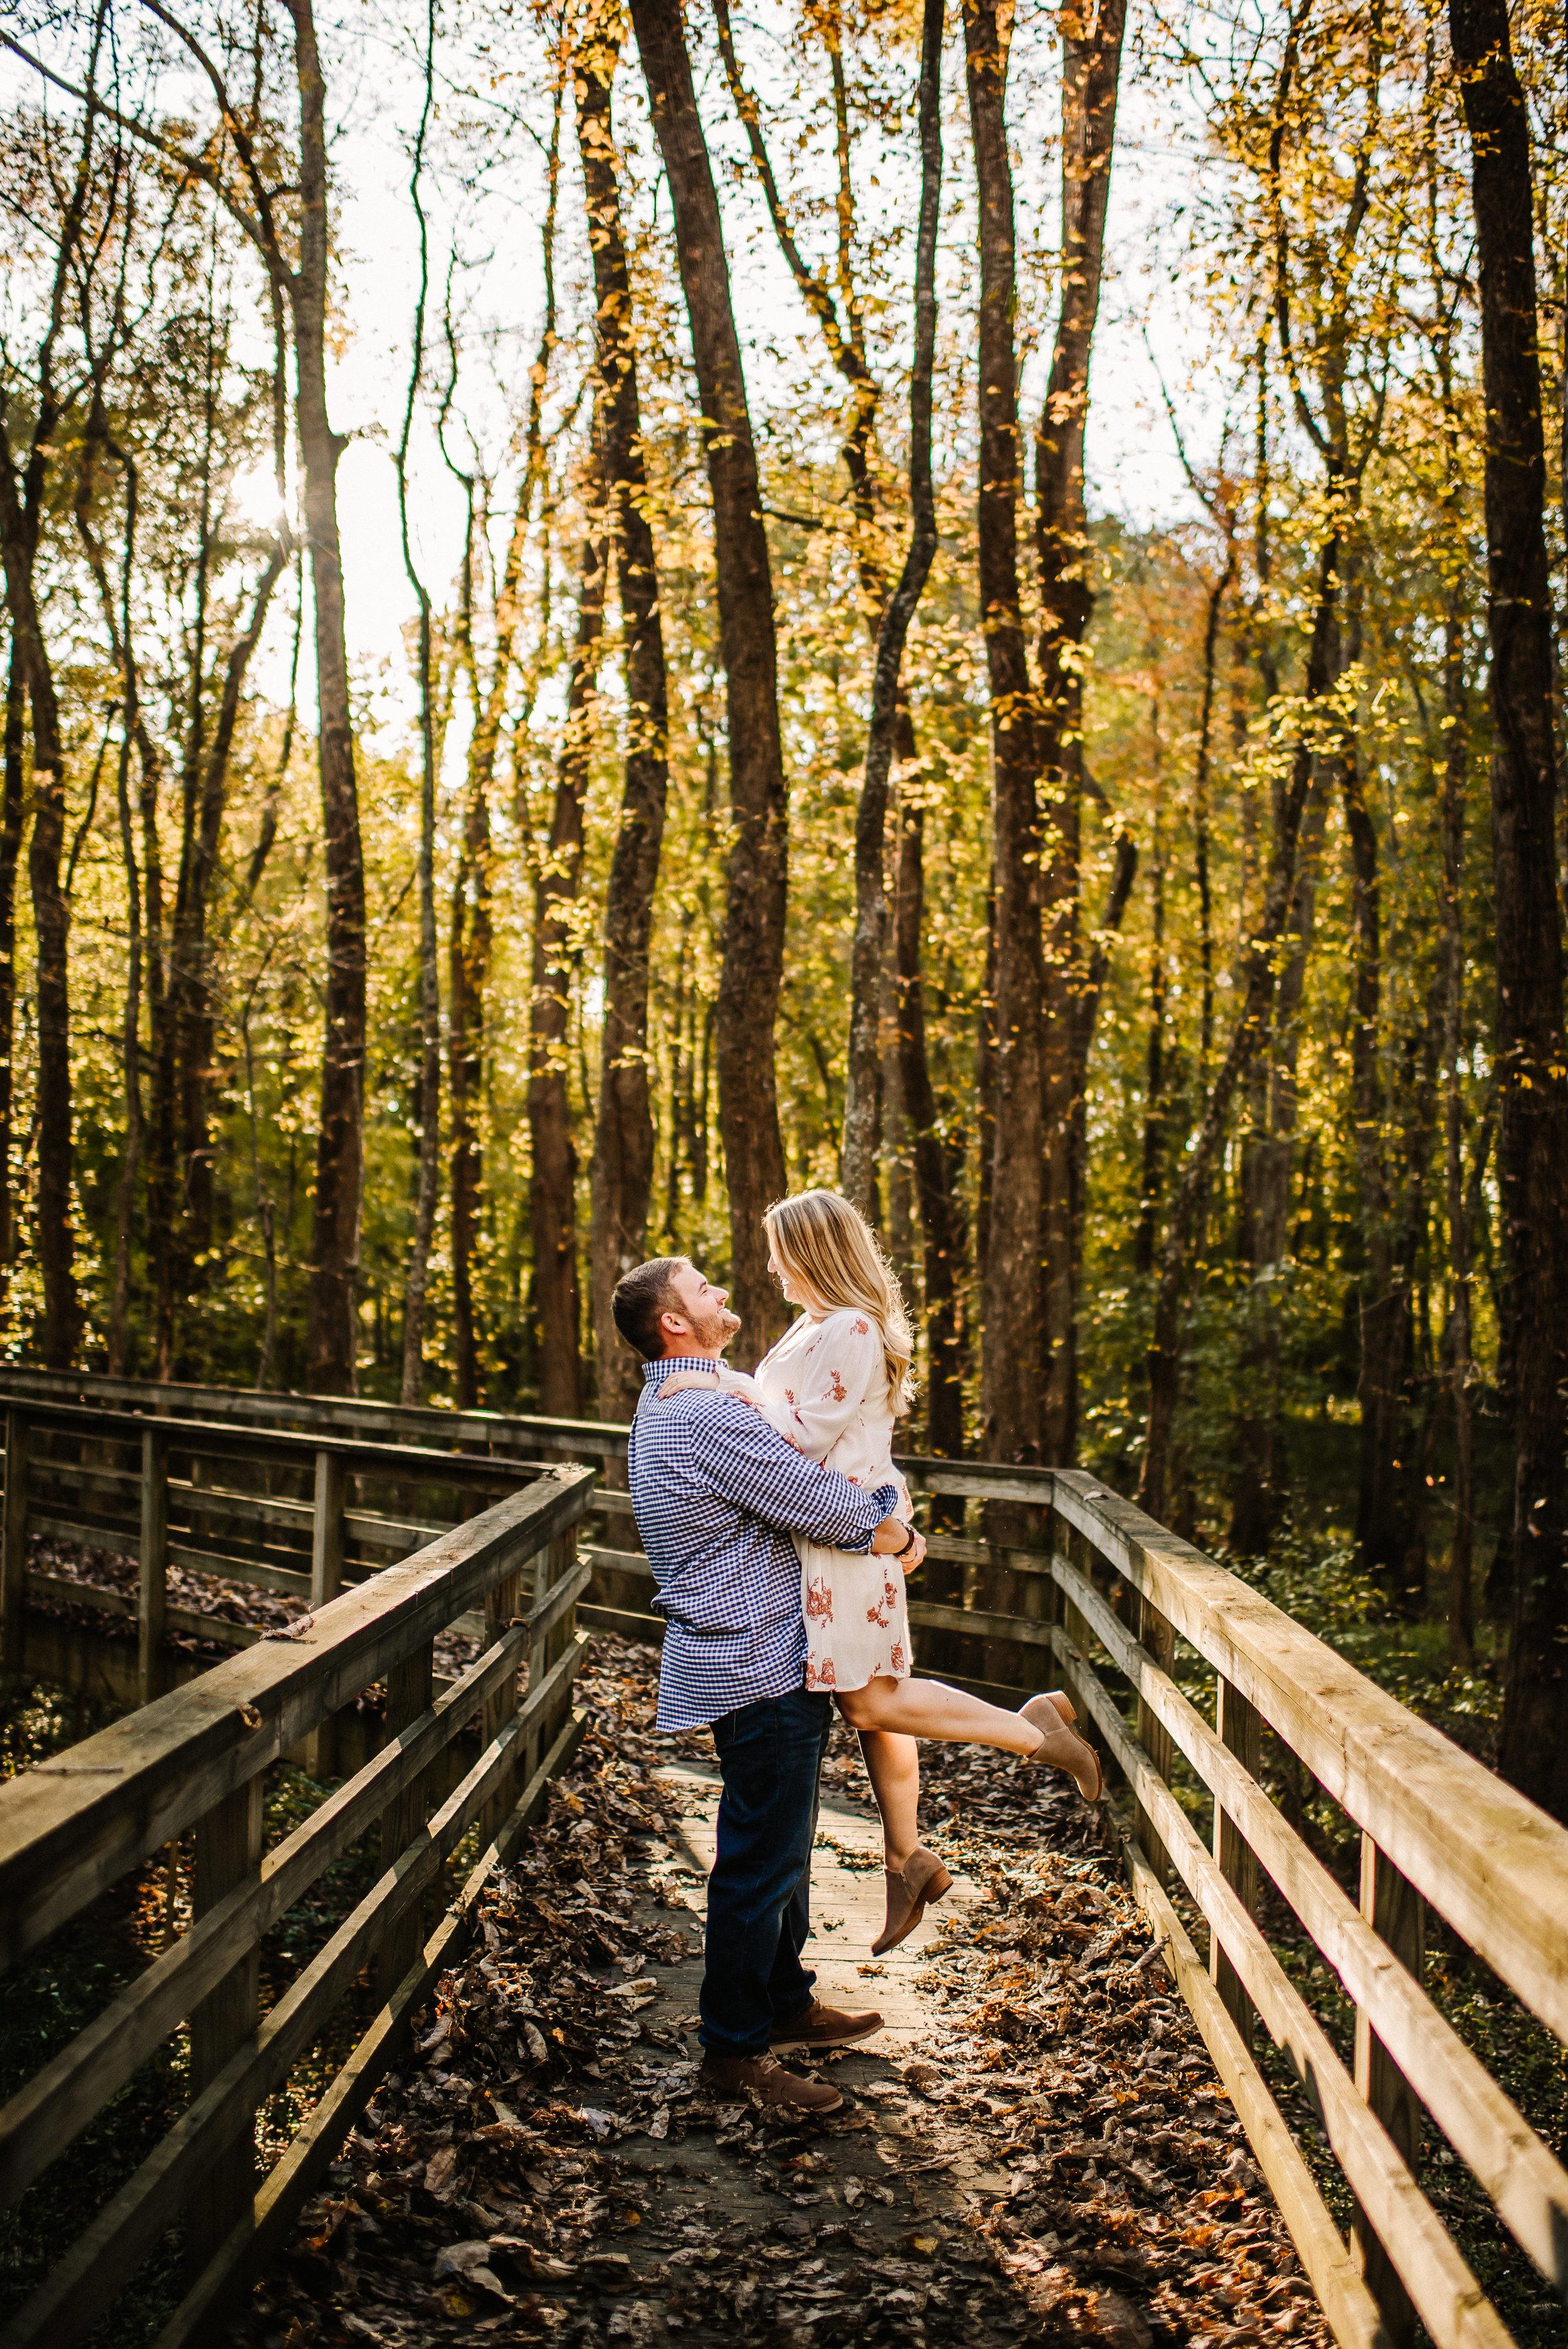 Romantic Fall Engagement Photography_Alexis & Jacob_Ashley Benham Photography-46.jpg